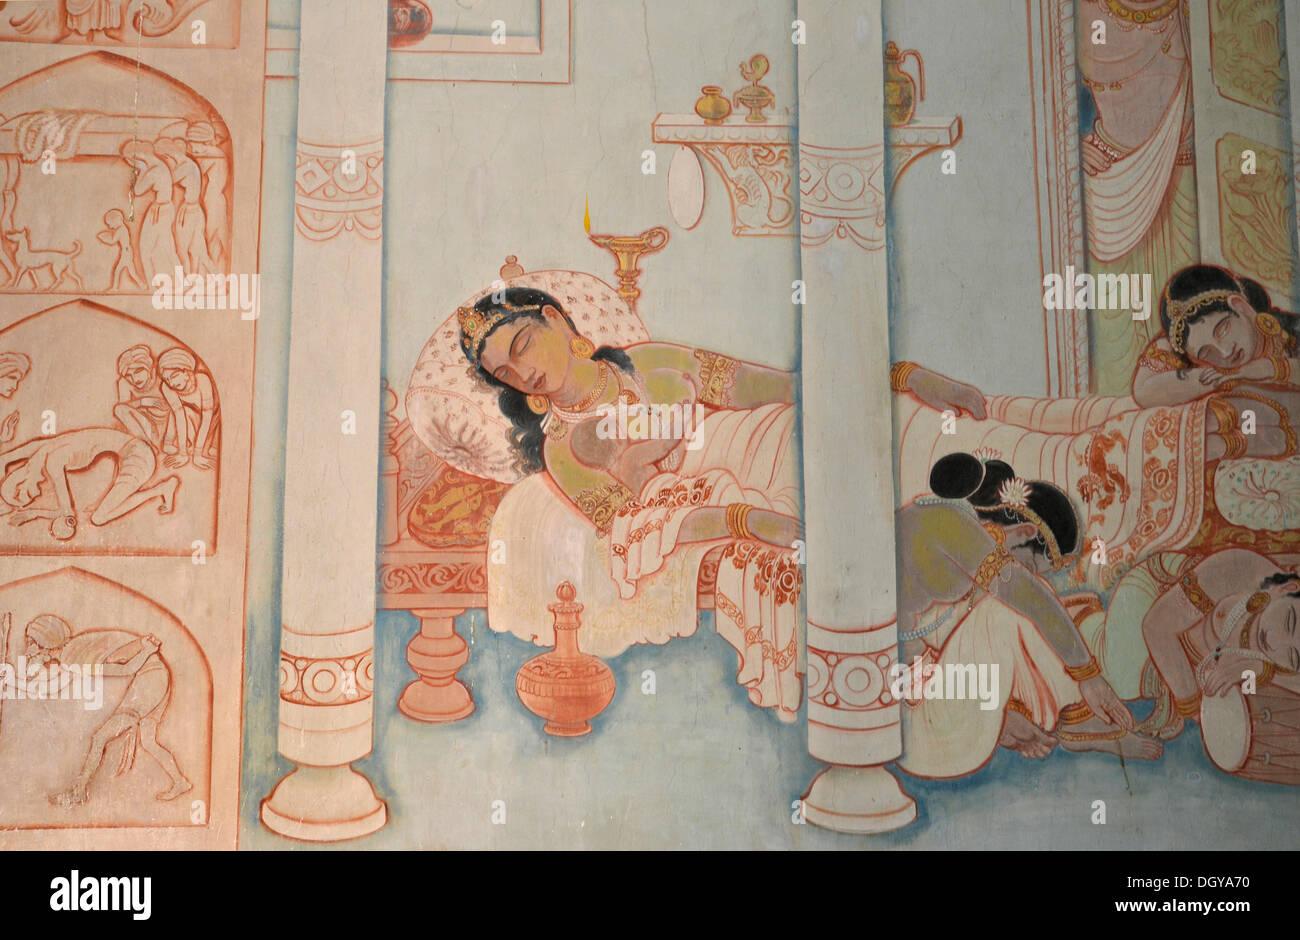 Religious frescoes, Kutti Vihar Temple, Mulagandha Kuti Vihara, Buddhist pilgrimage destination, Sarnath, Varanasi - Stock Image